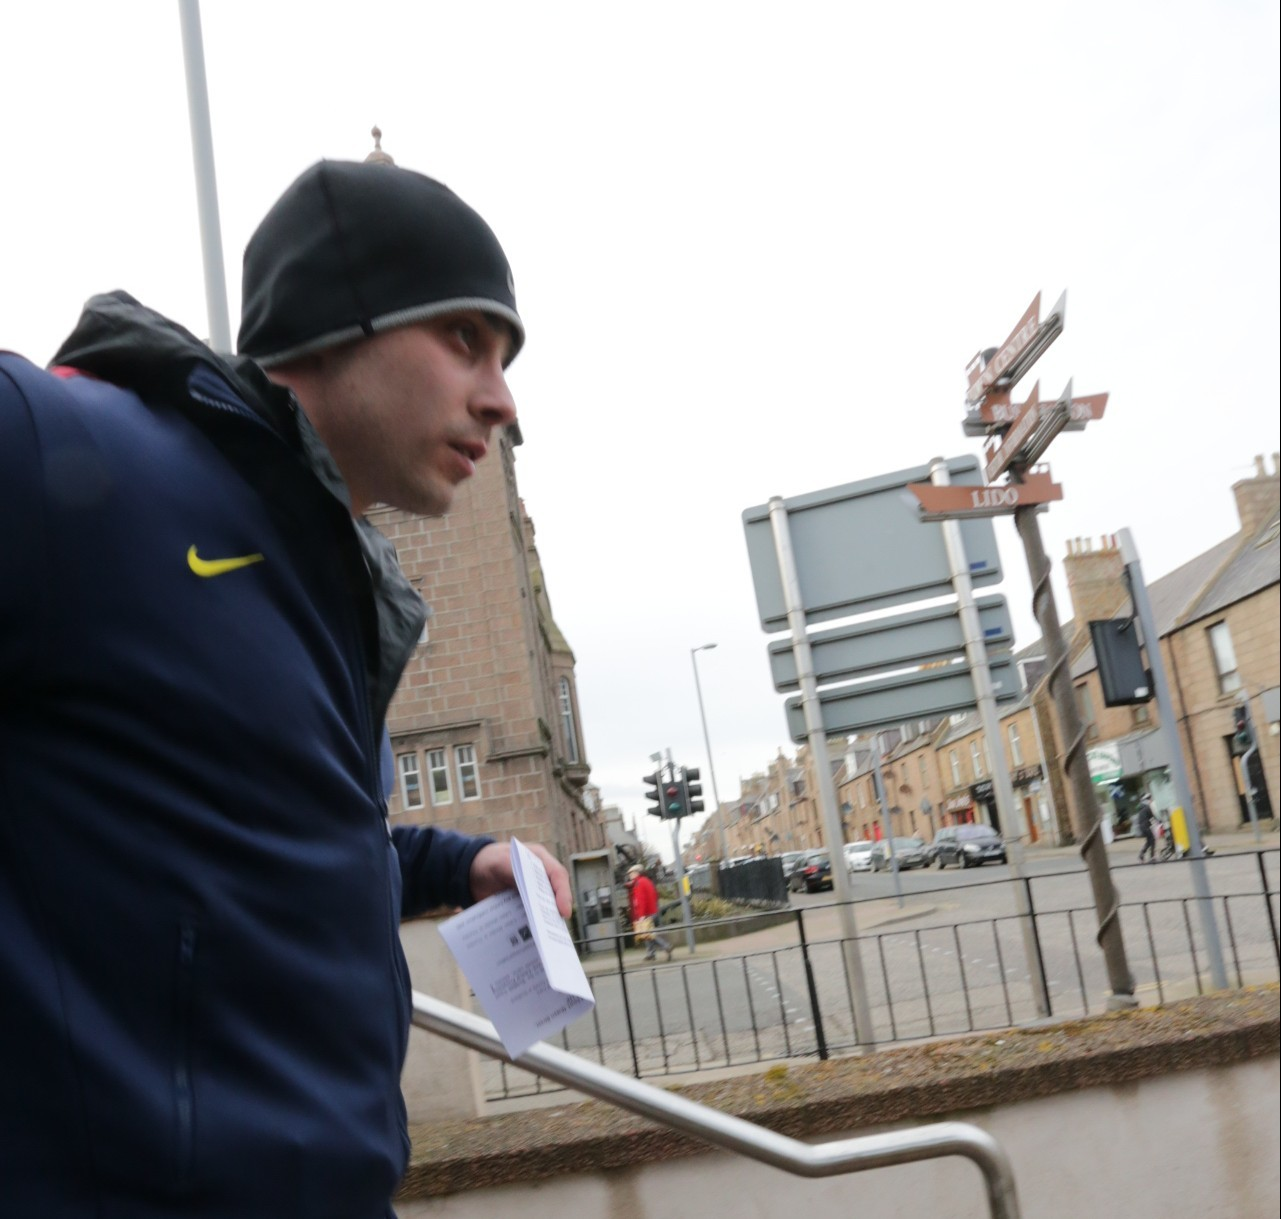 Kestutis Jaraminas leaves court after being fined £300.